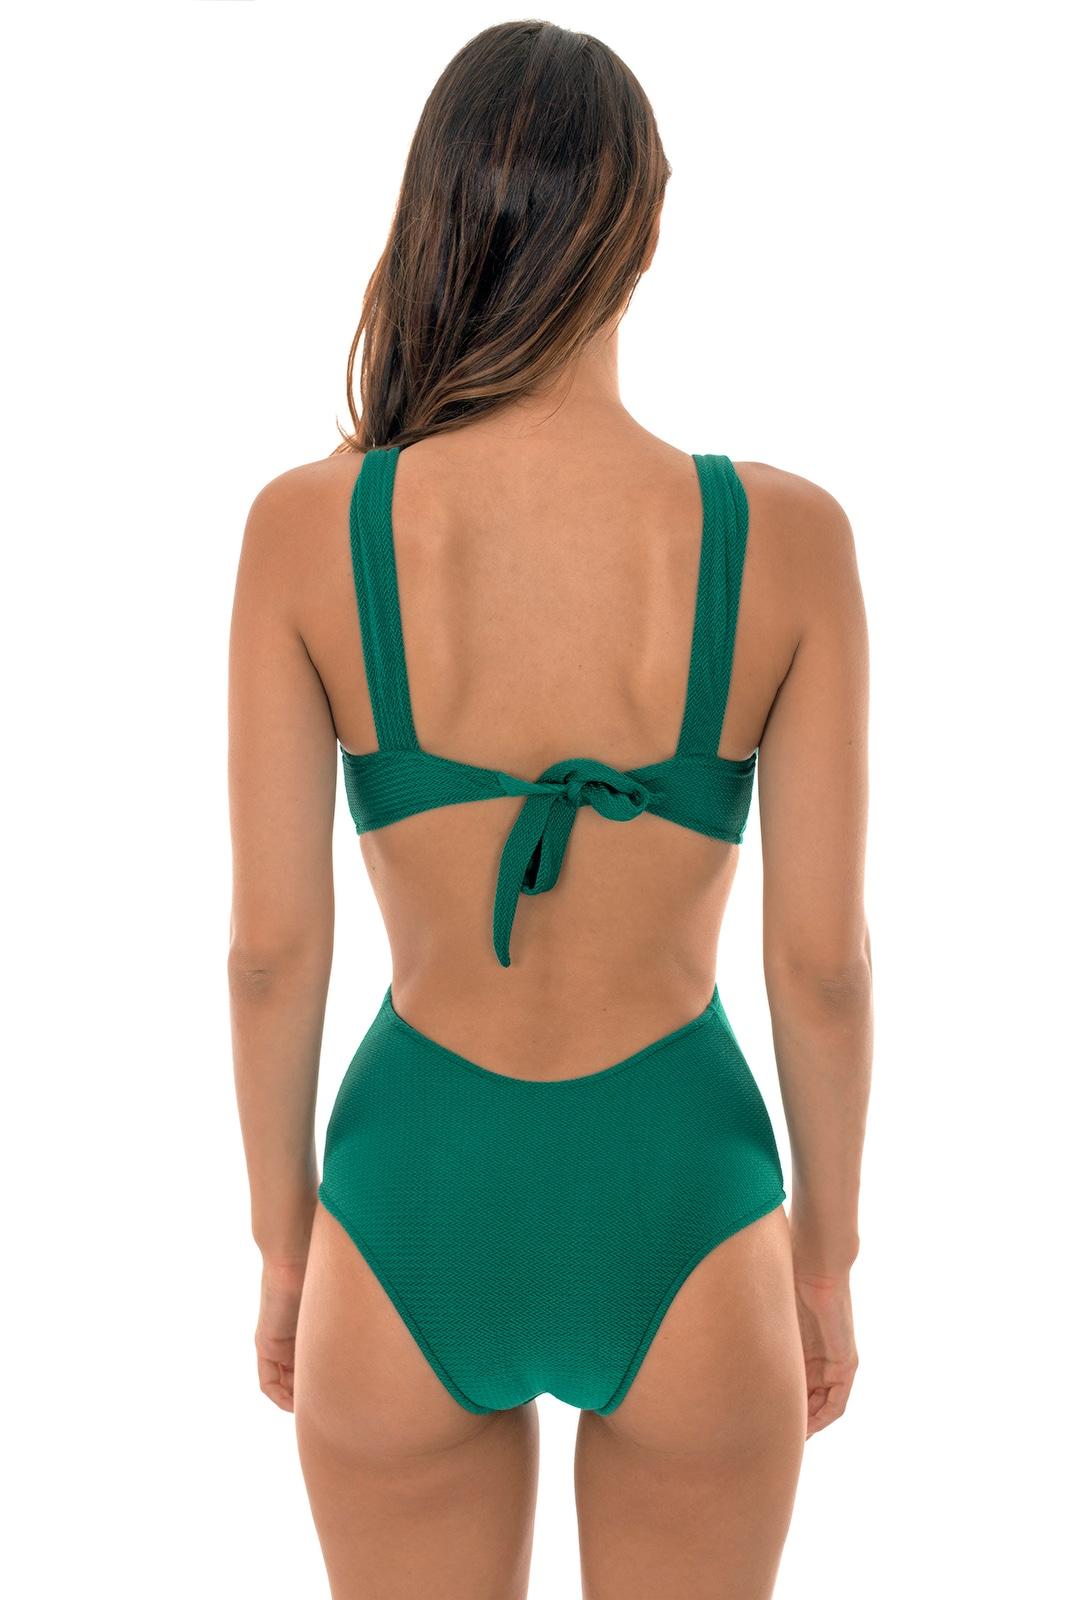 4a7c4baa ... Grønn badedrakt med tekstur, dyp utringning - DUNA GREEN TRIQUINI ...